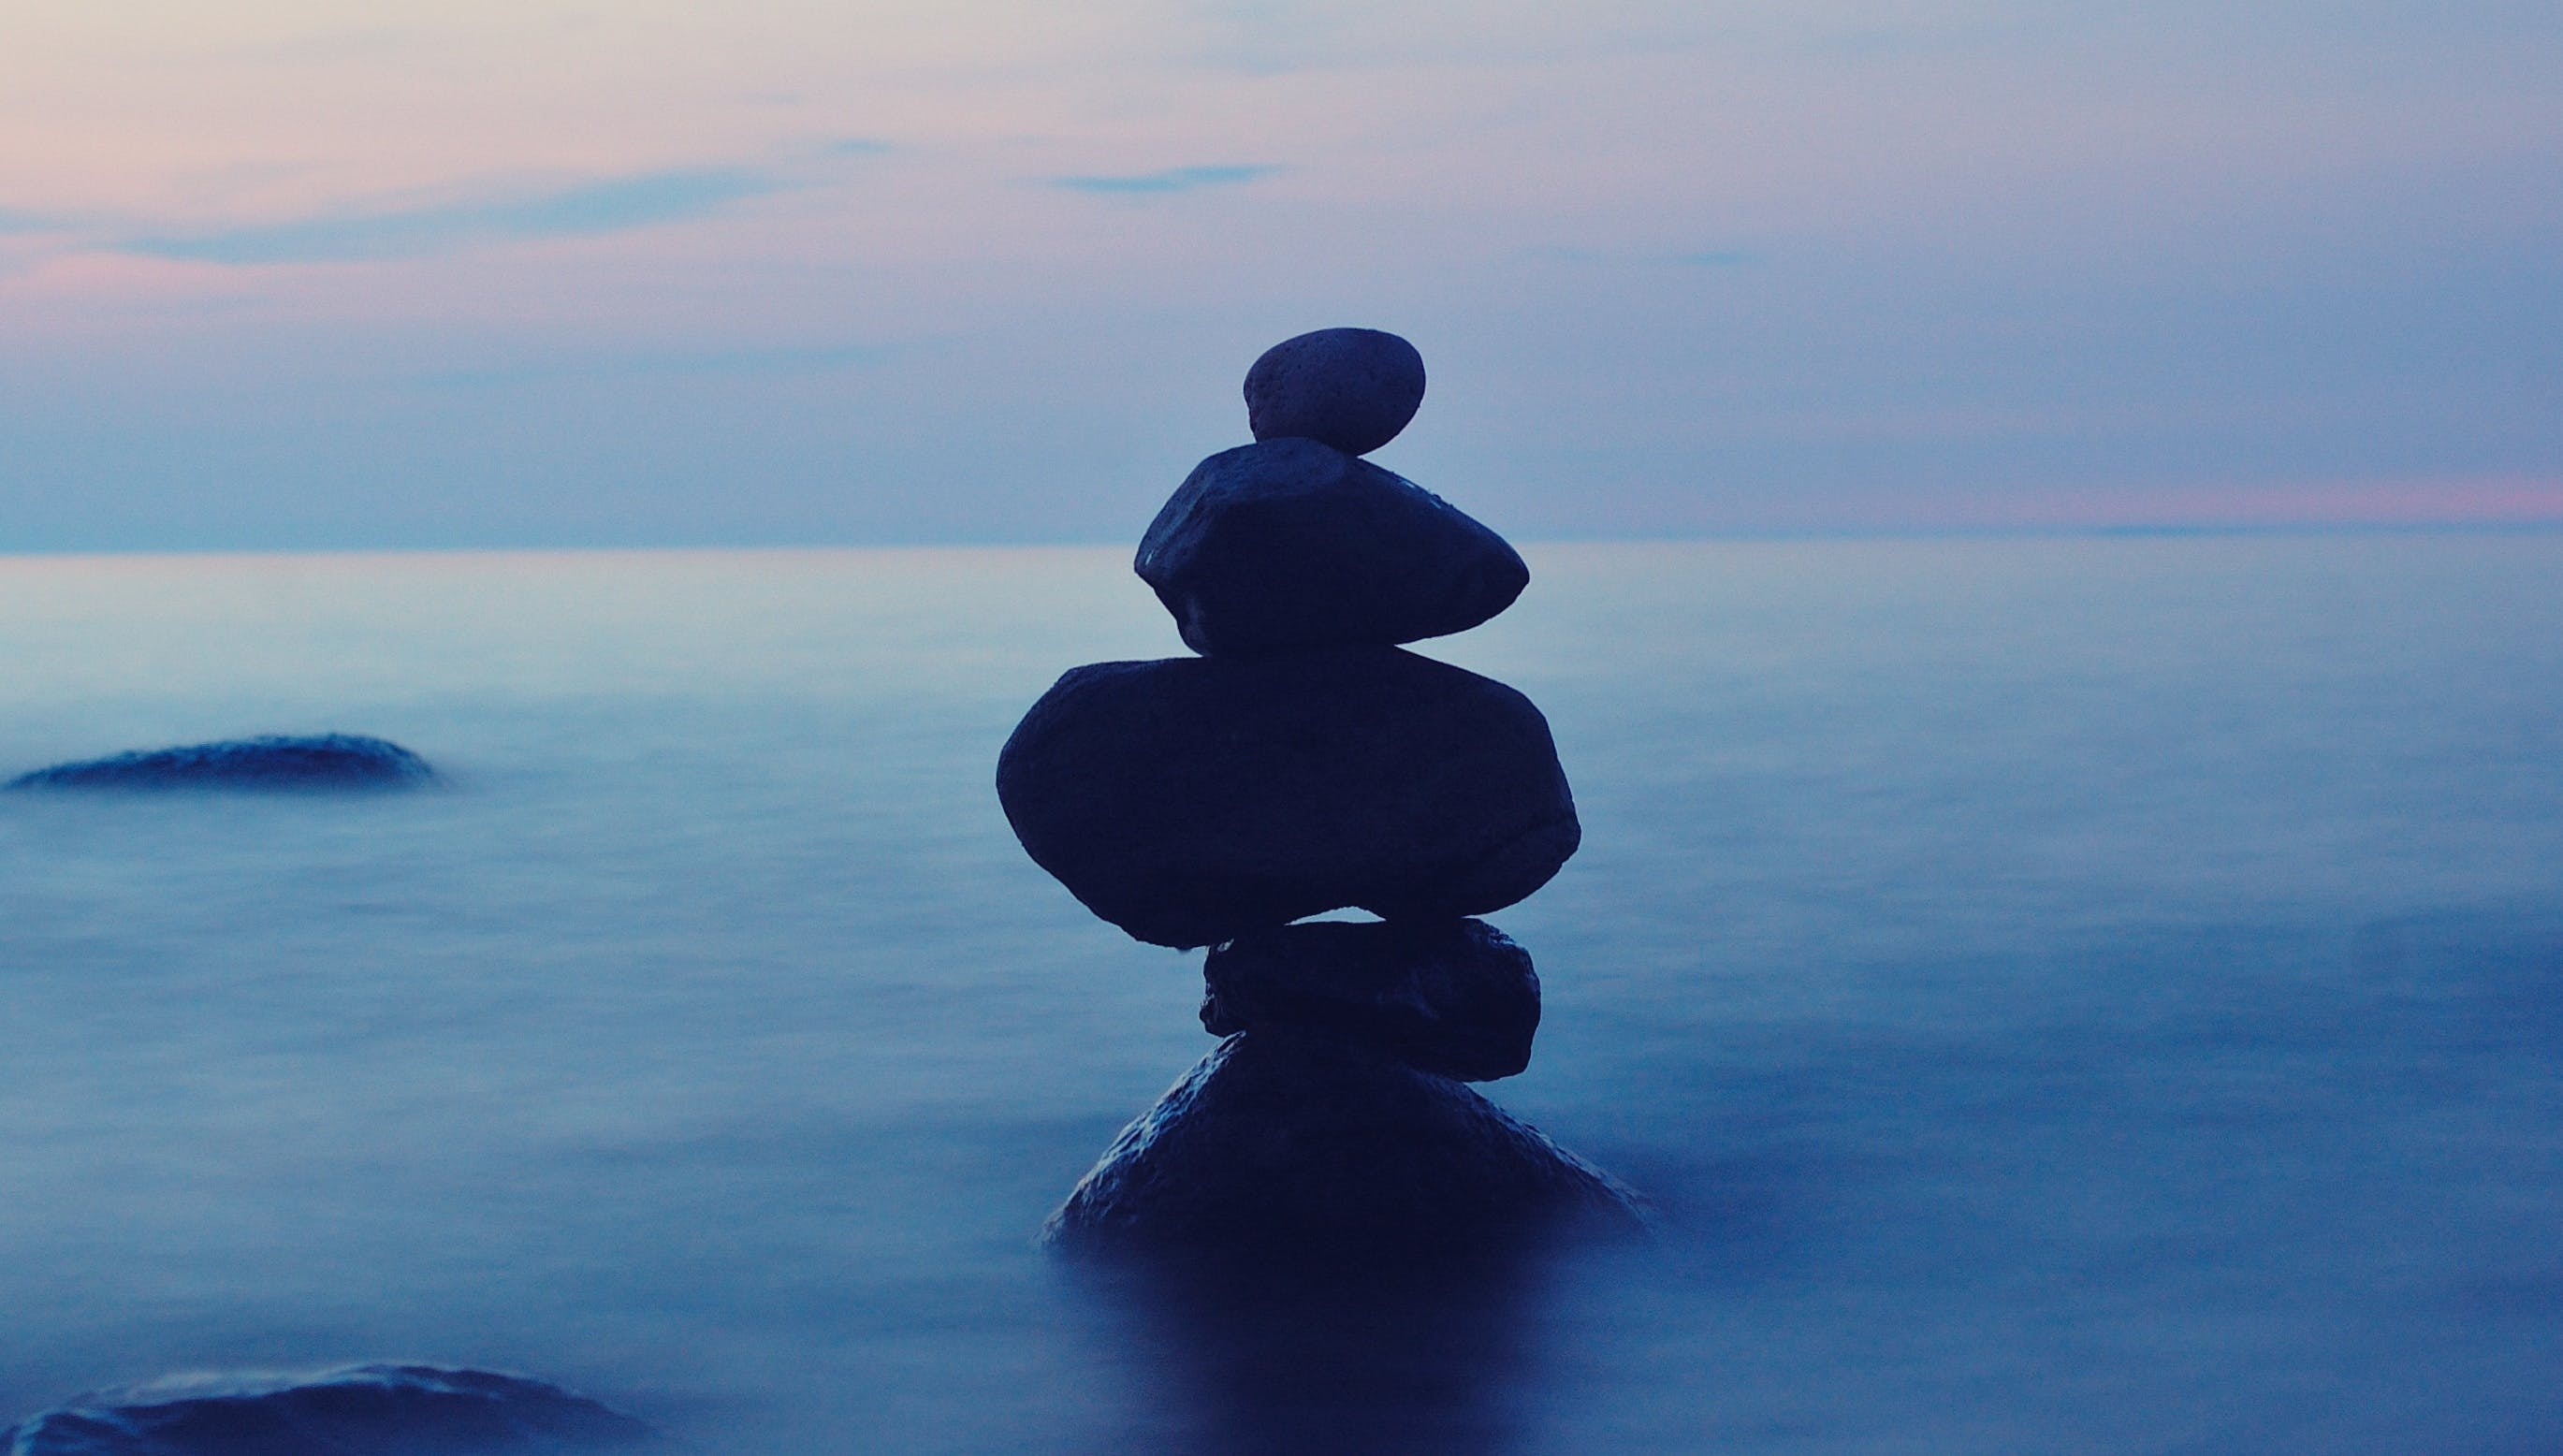 Kostenloses Stock Foto zu balance, entspannung, felsen, meer